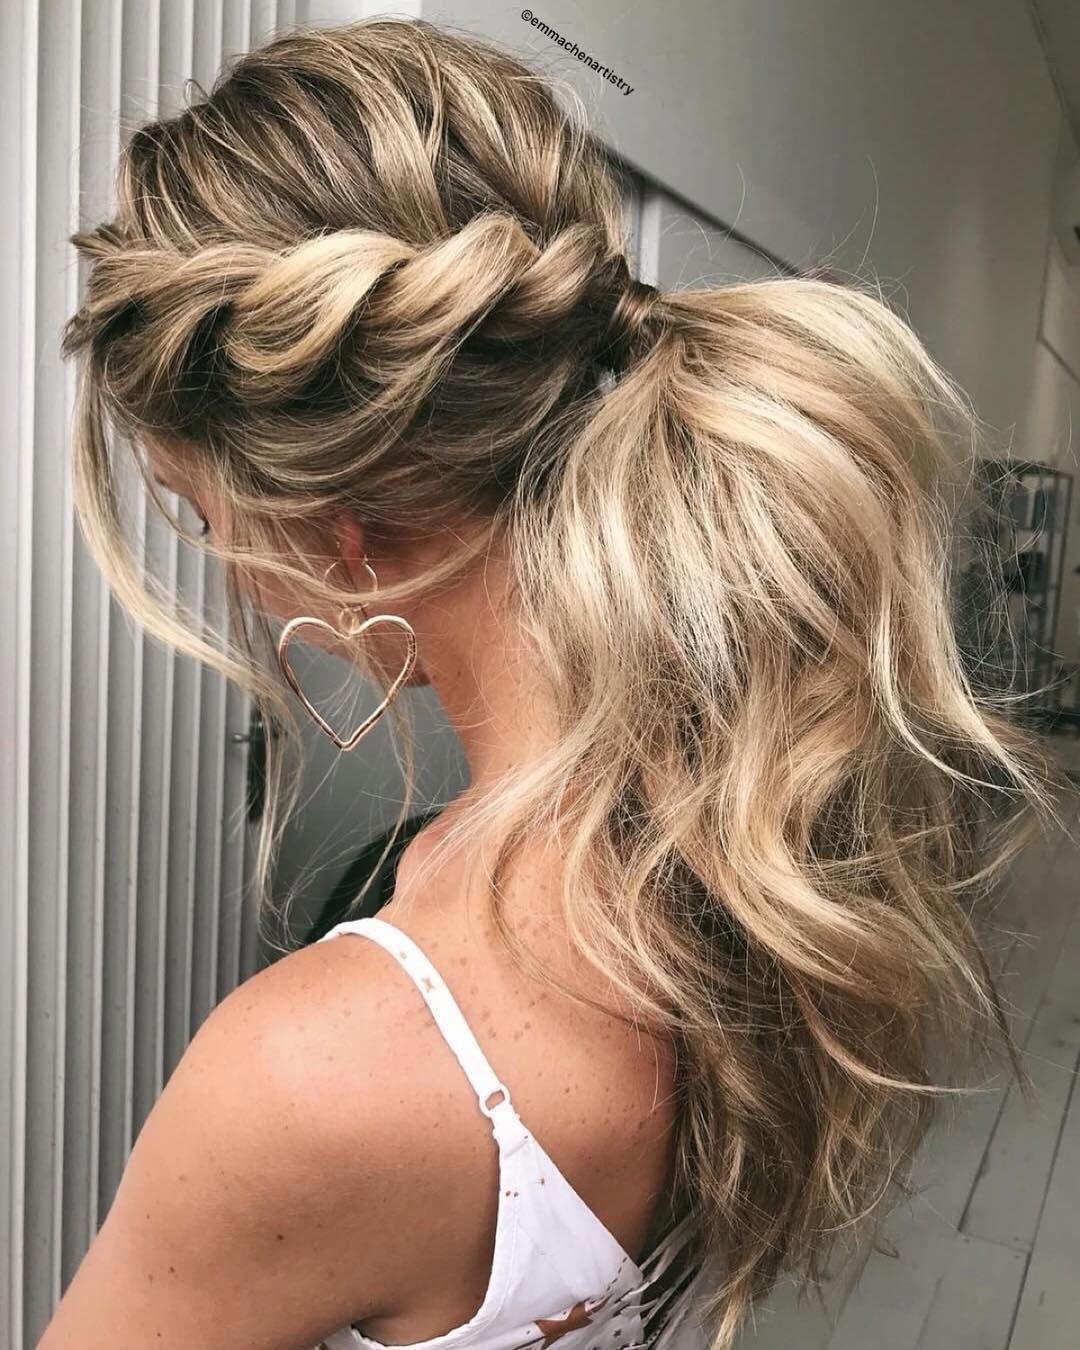 Hair Updos For Medium Hair Black Hair Smart Hair Updos 20190312 Peinados Poco Cabello Peinados Elegantes Peinados Con Trenzas